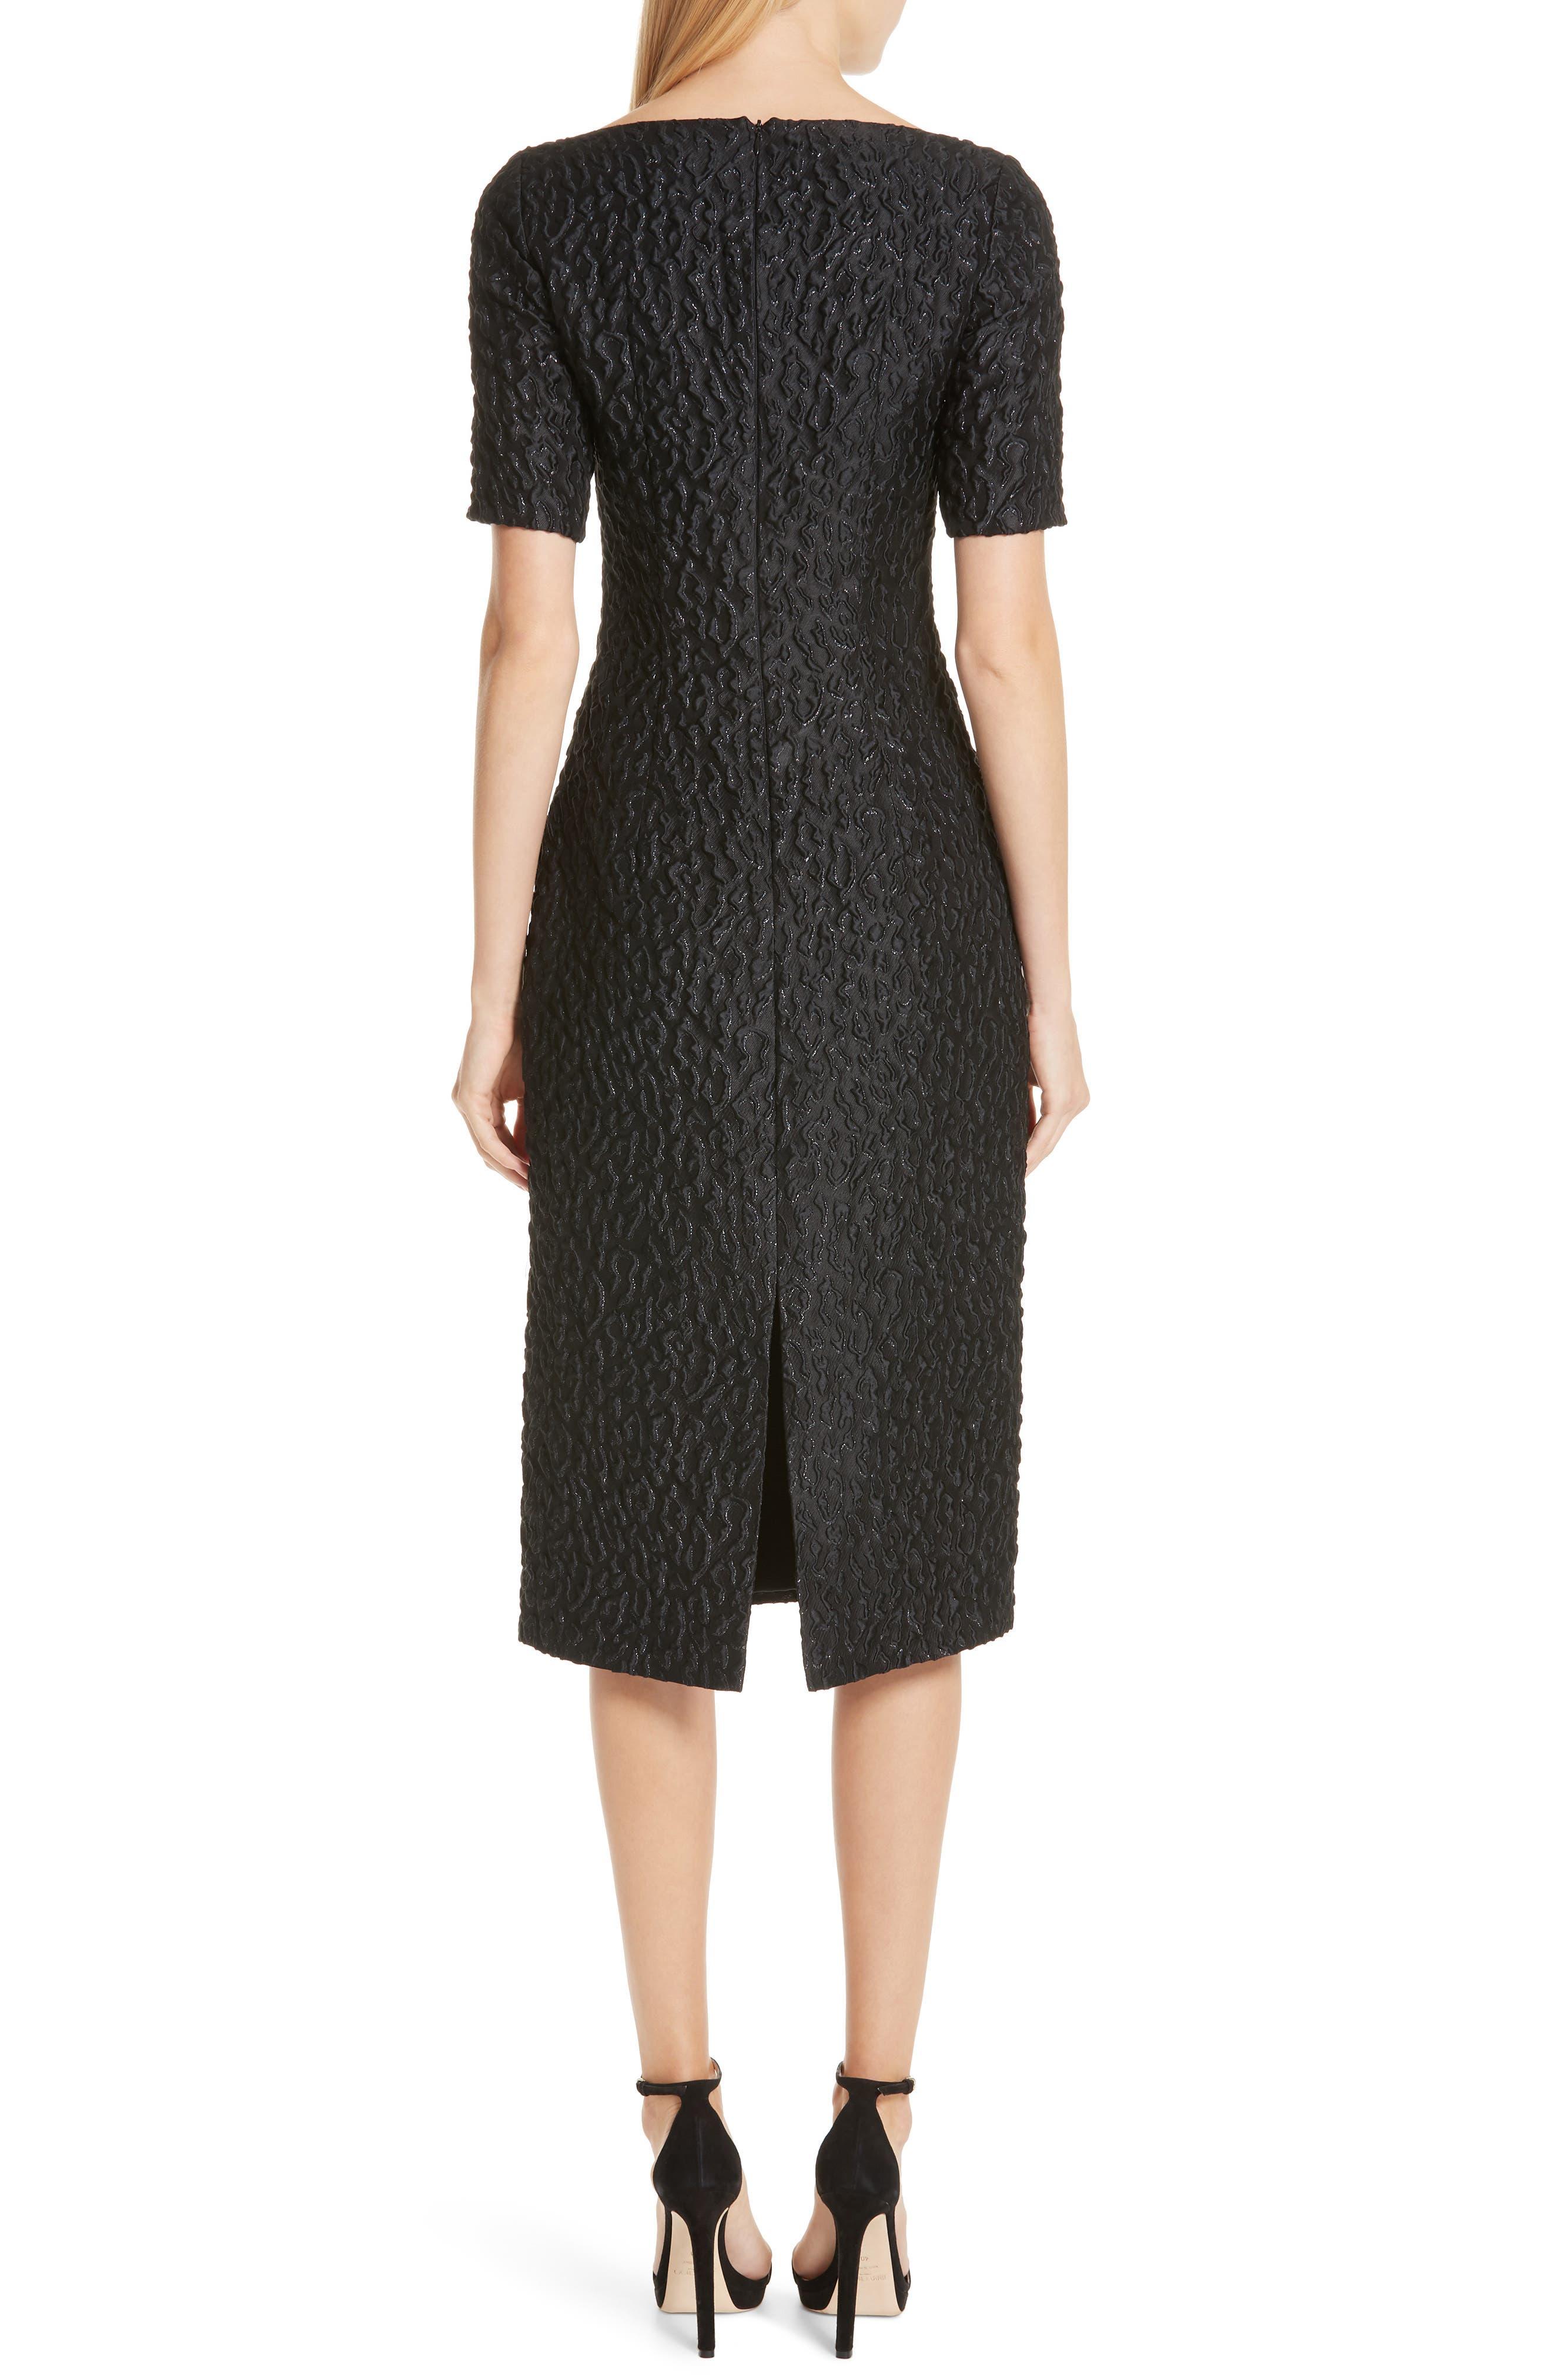 BRANDON MAXWELL, Leopard Jacquard Sheath Dress, Alternate thumbnail 2, color, BLACK